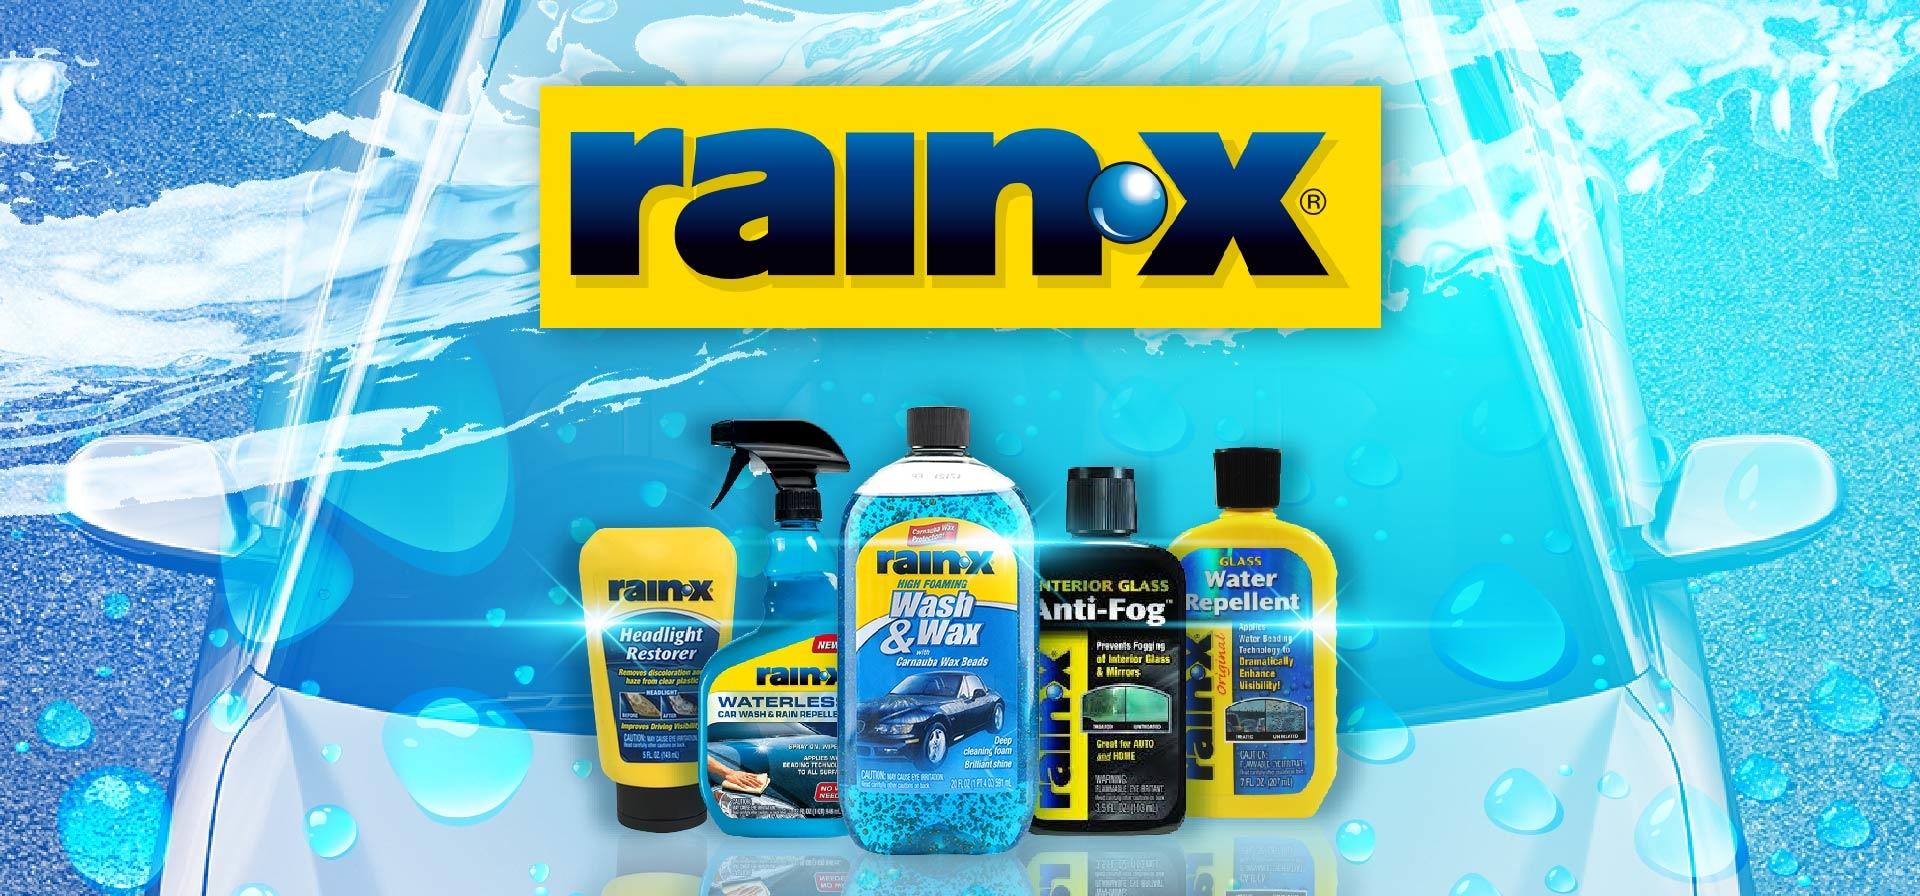 rain x,潤克斯, rain-x, rainx, 汽車美容, 撥水劑, 汽車玻璃 清潔劑, 除油膜, 洗車精, 洗車精 推薦, 美國原裝進口洗車精, 二合一